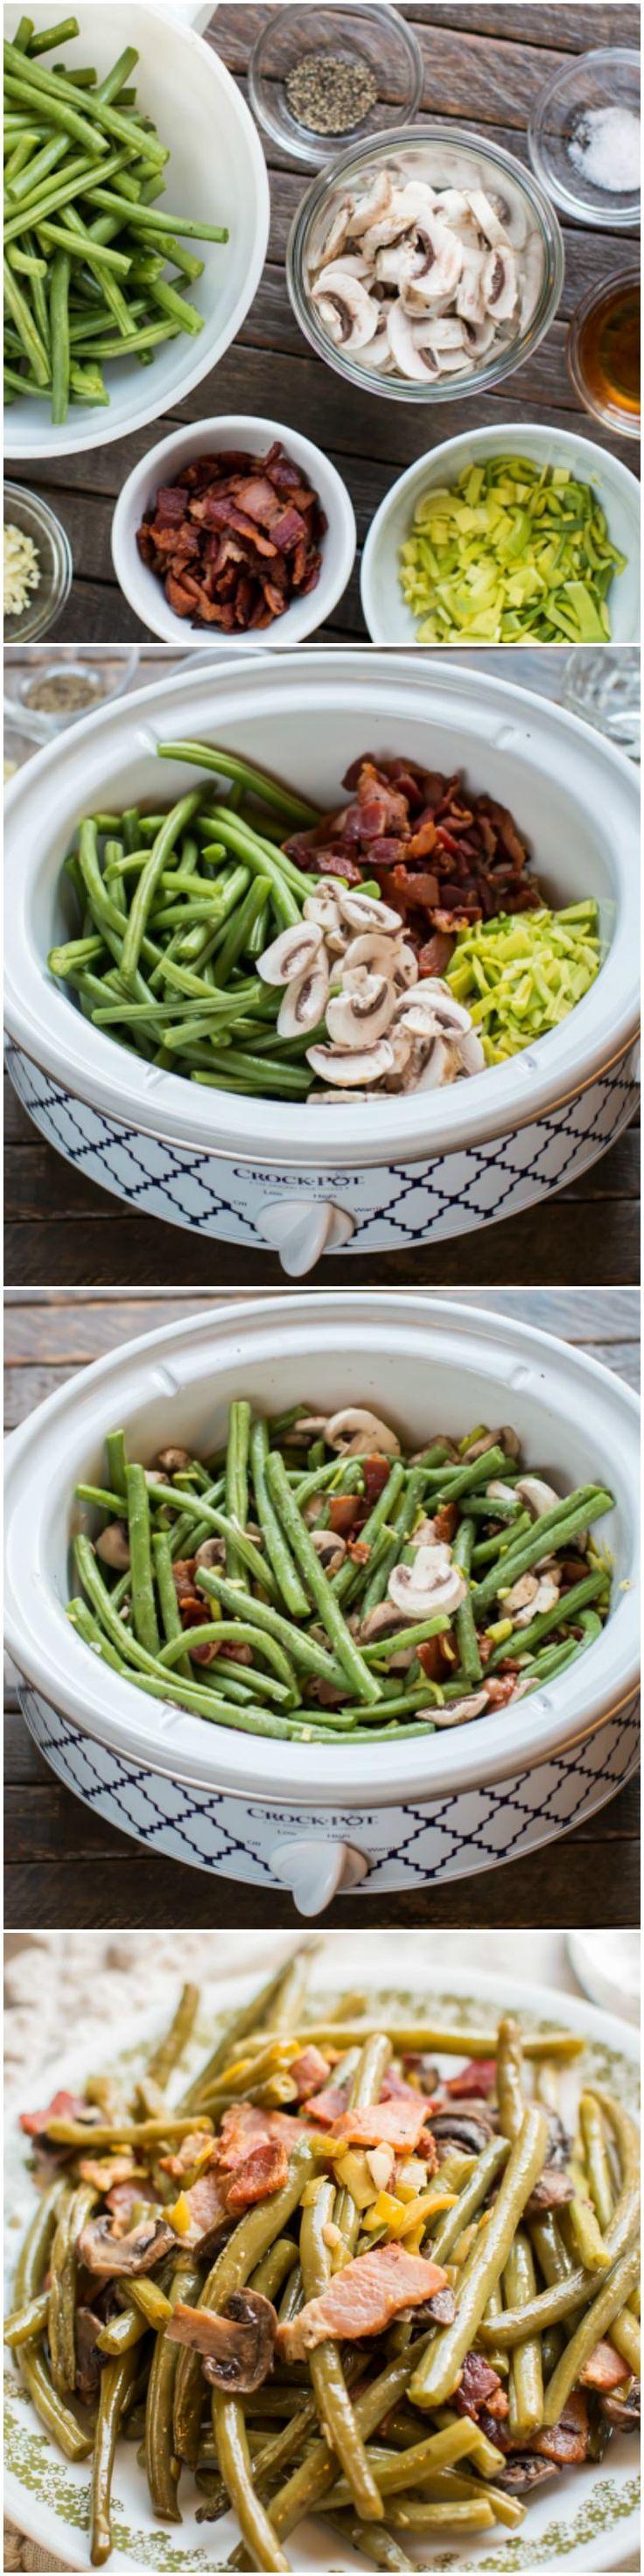 Slow Cooker Holiday Green Beans @crock-pot #CrockPotRecipes #ad